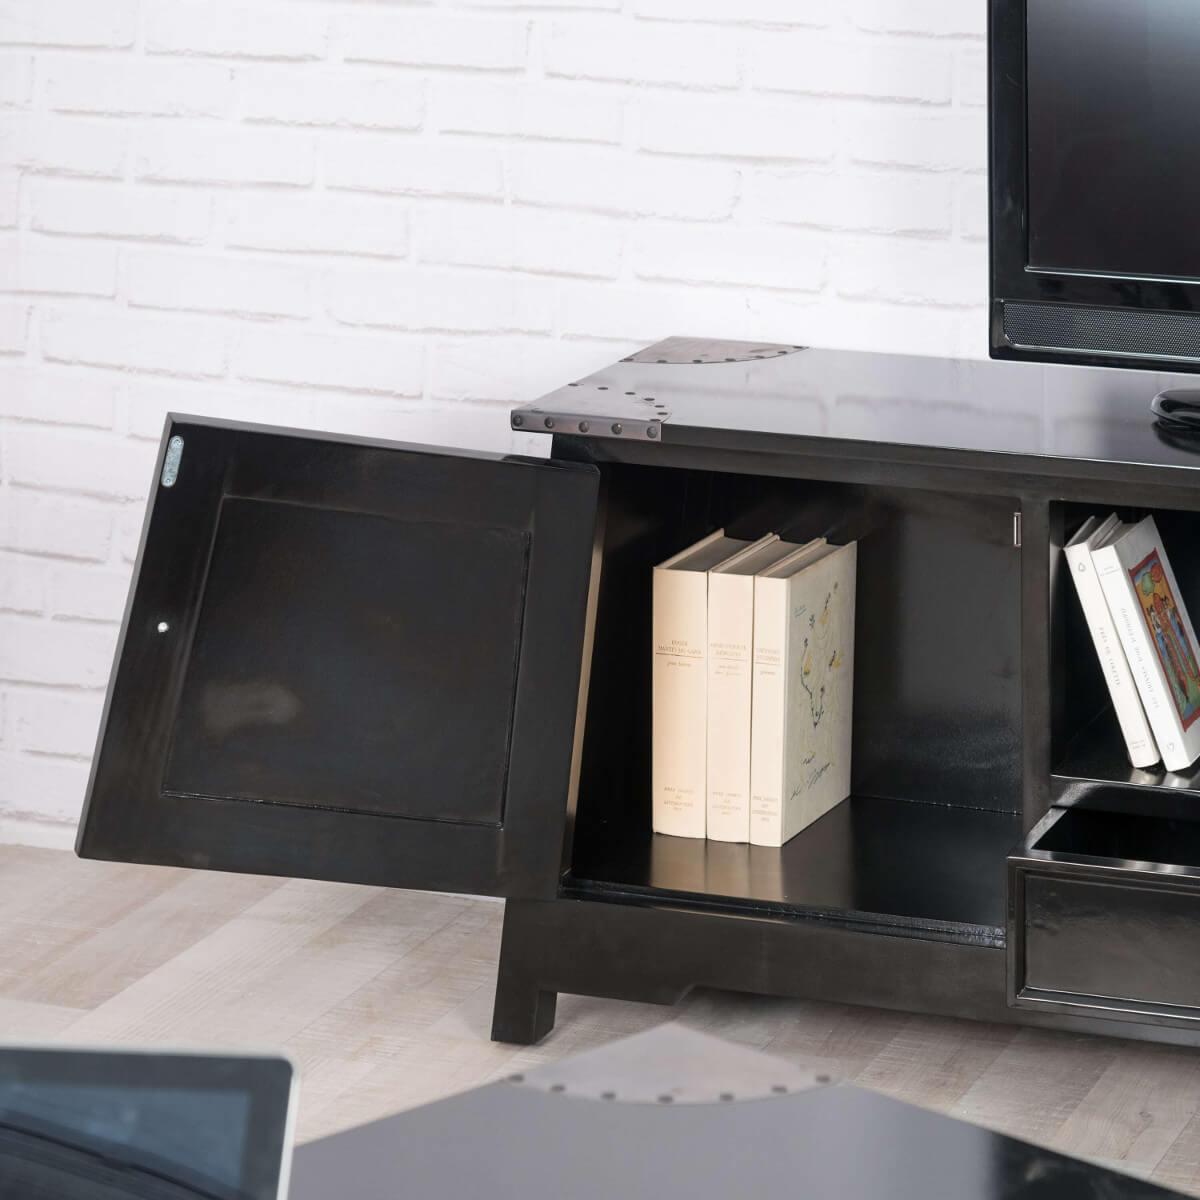 Meuble Tv Noir Meuble Tv Bois Metal Rectangle Acajou Thao 150 Cm # Meuble Noir Et Bois